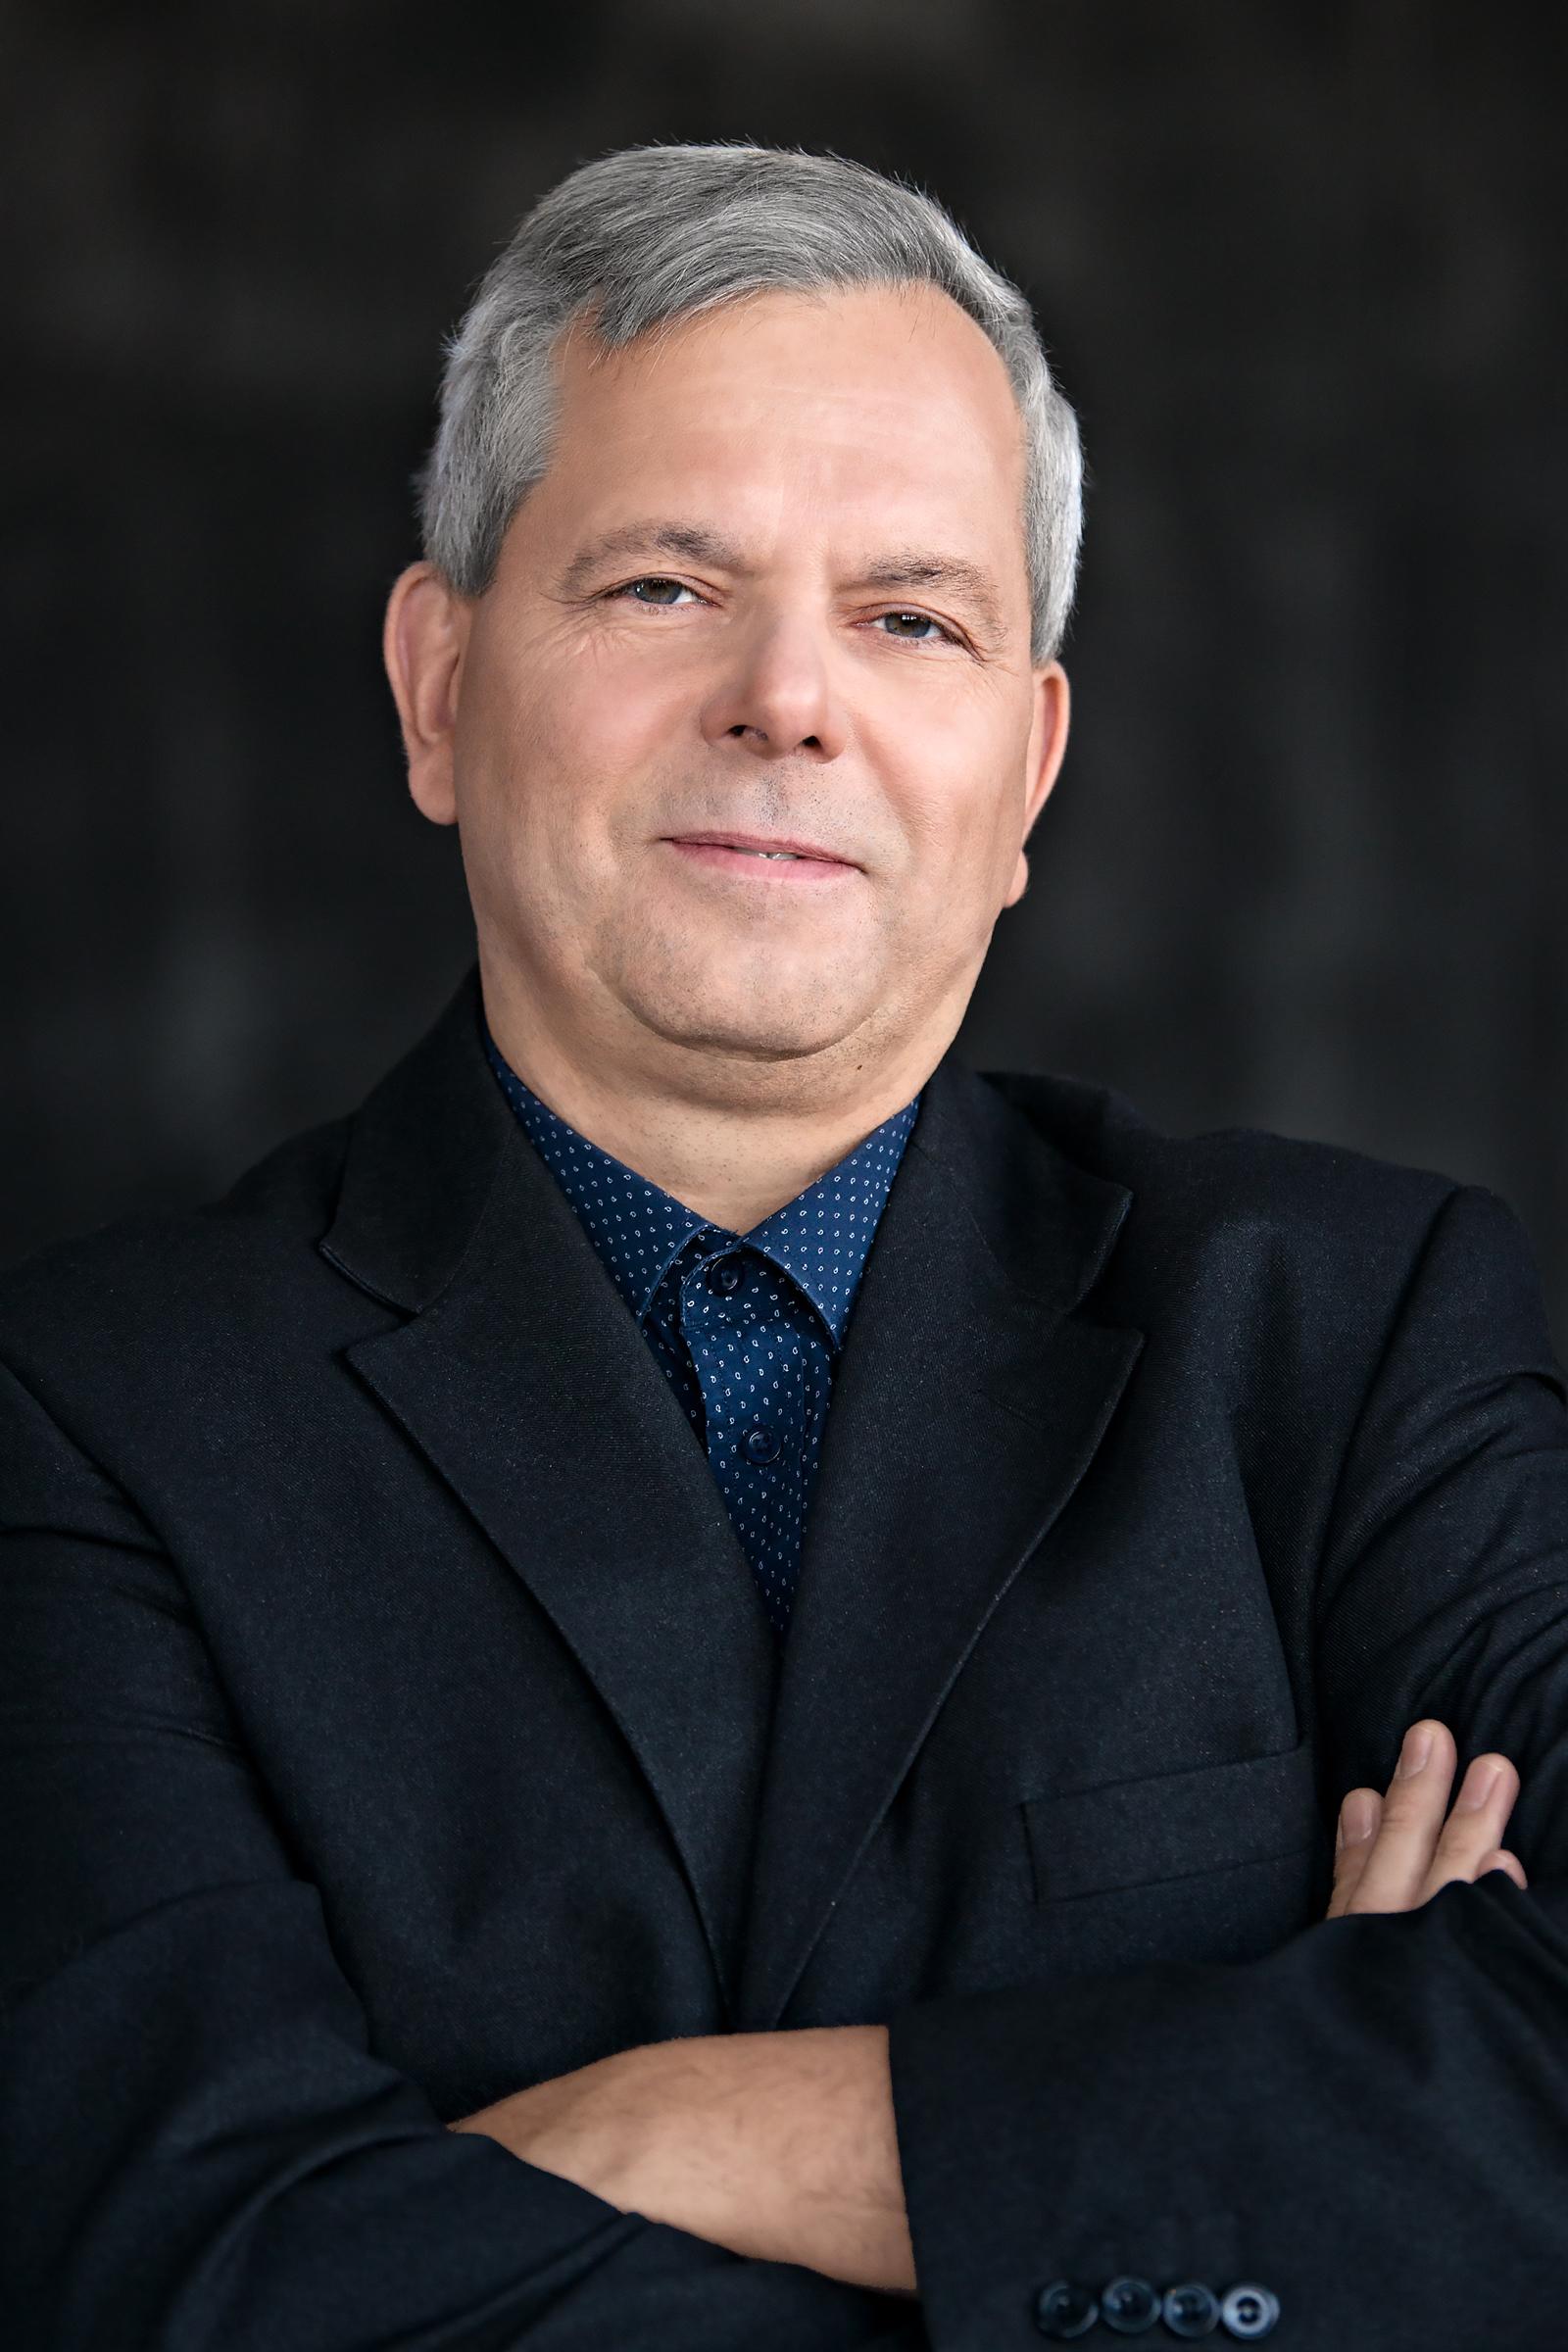 Vytautas Grigoraitis